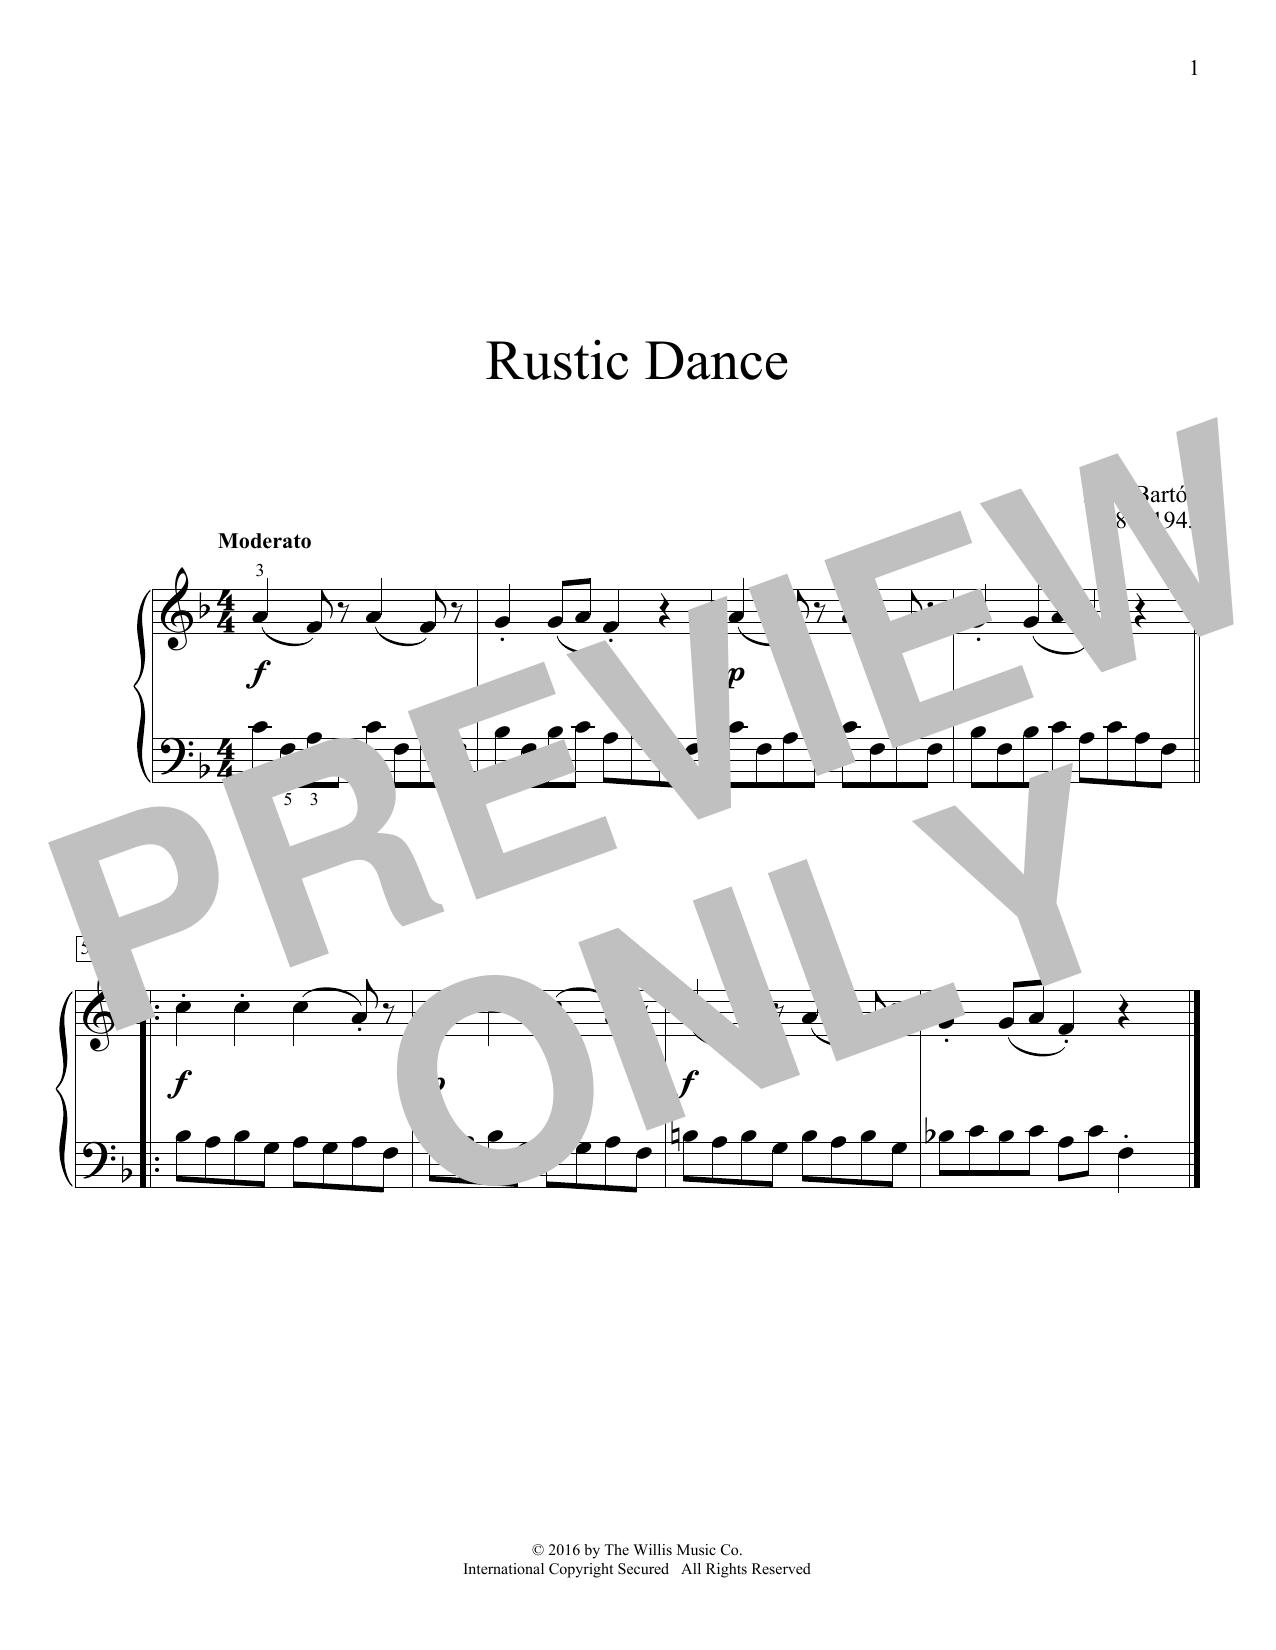 Rustic Dance Sheet Music